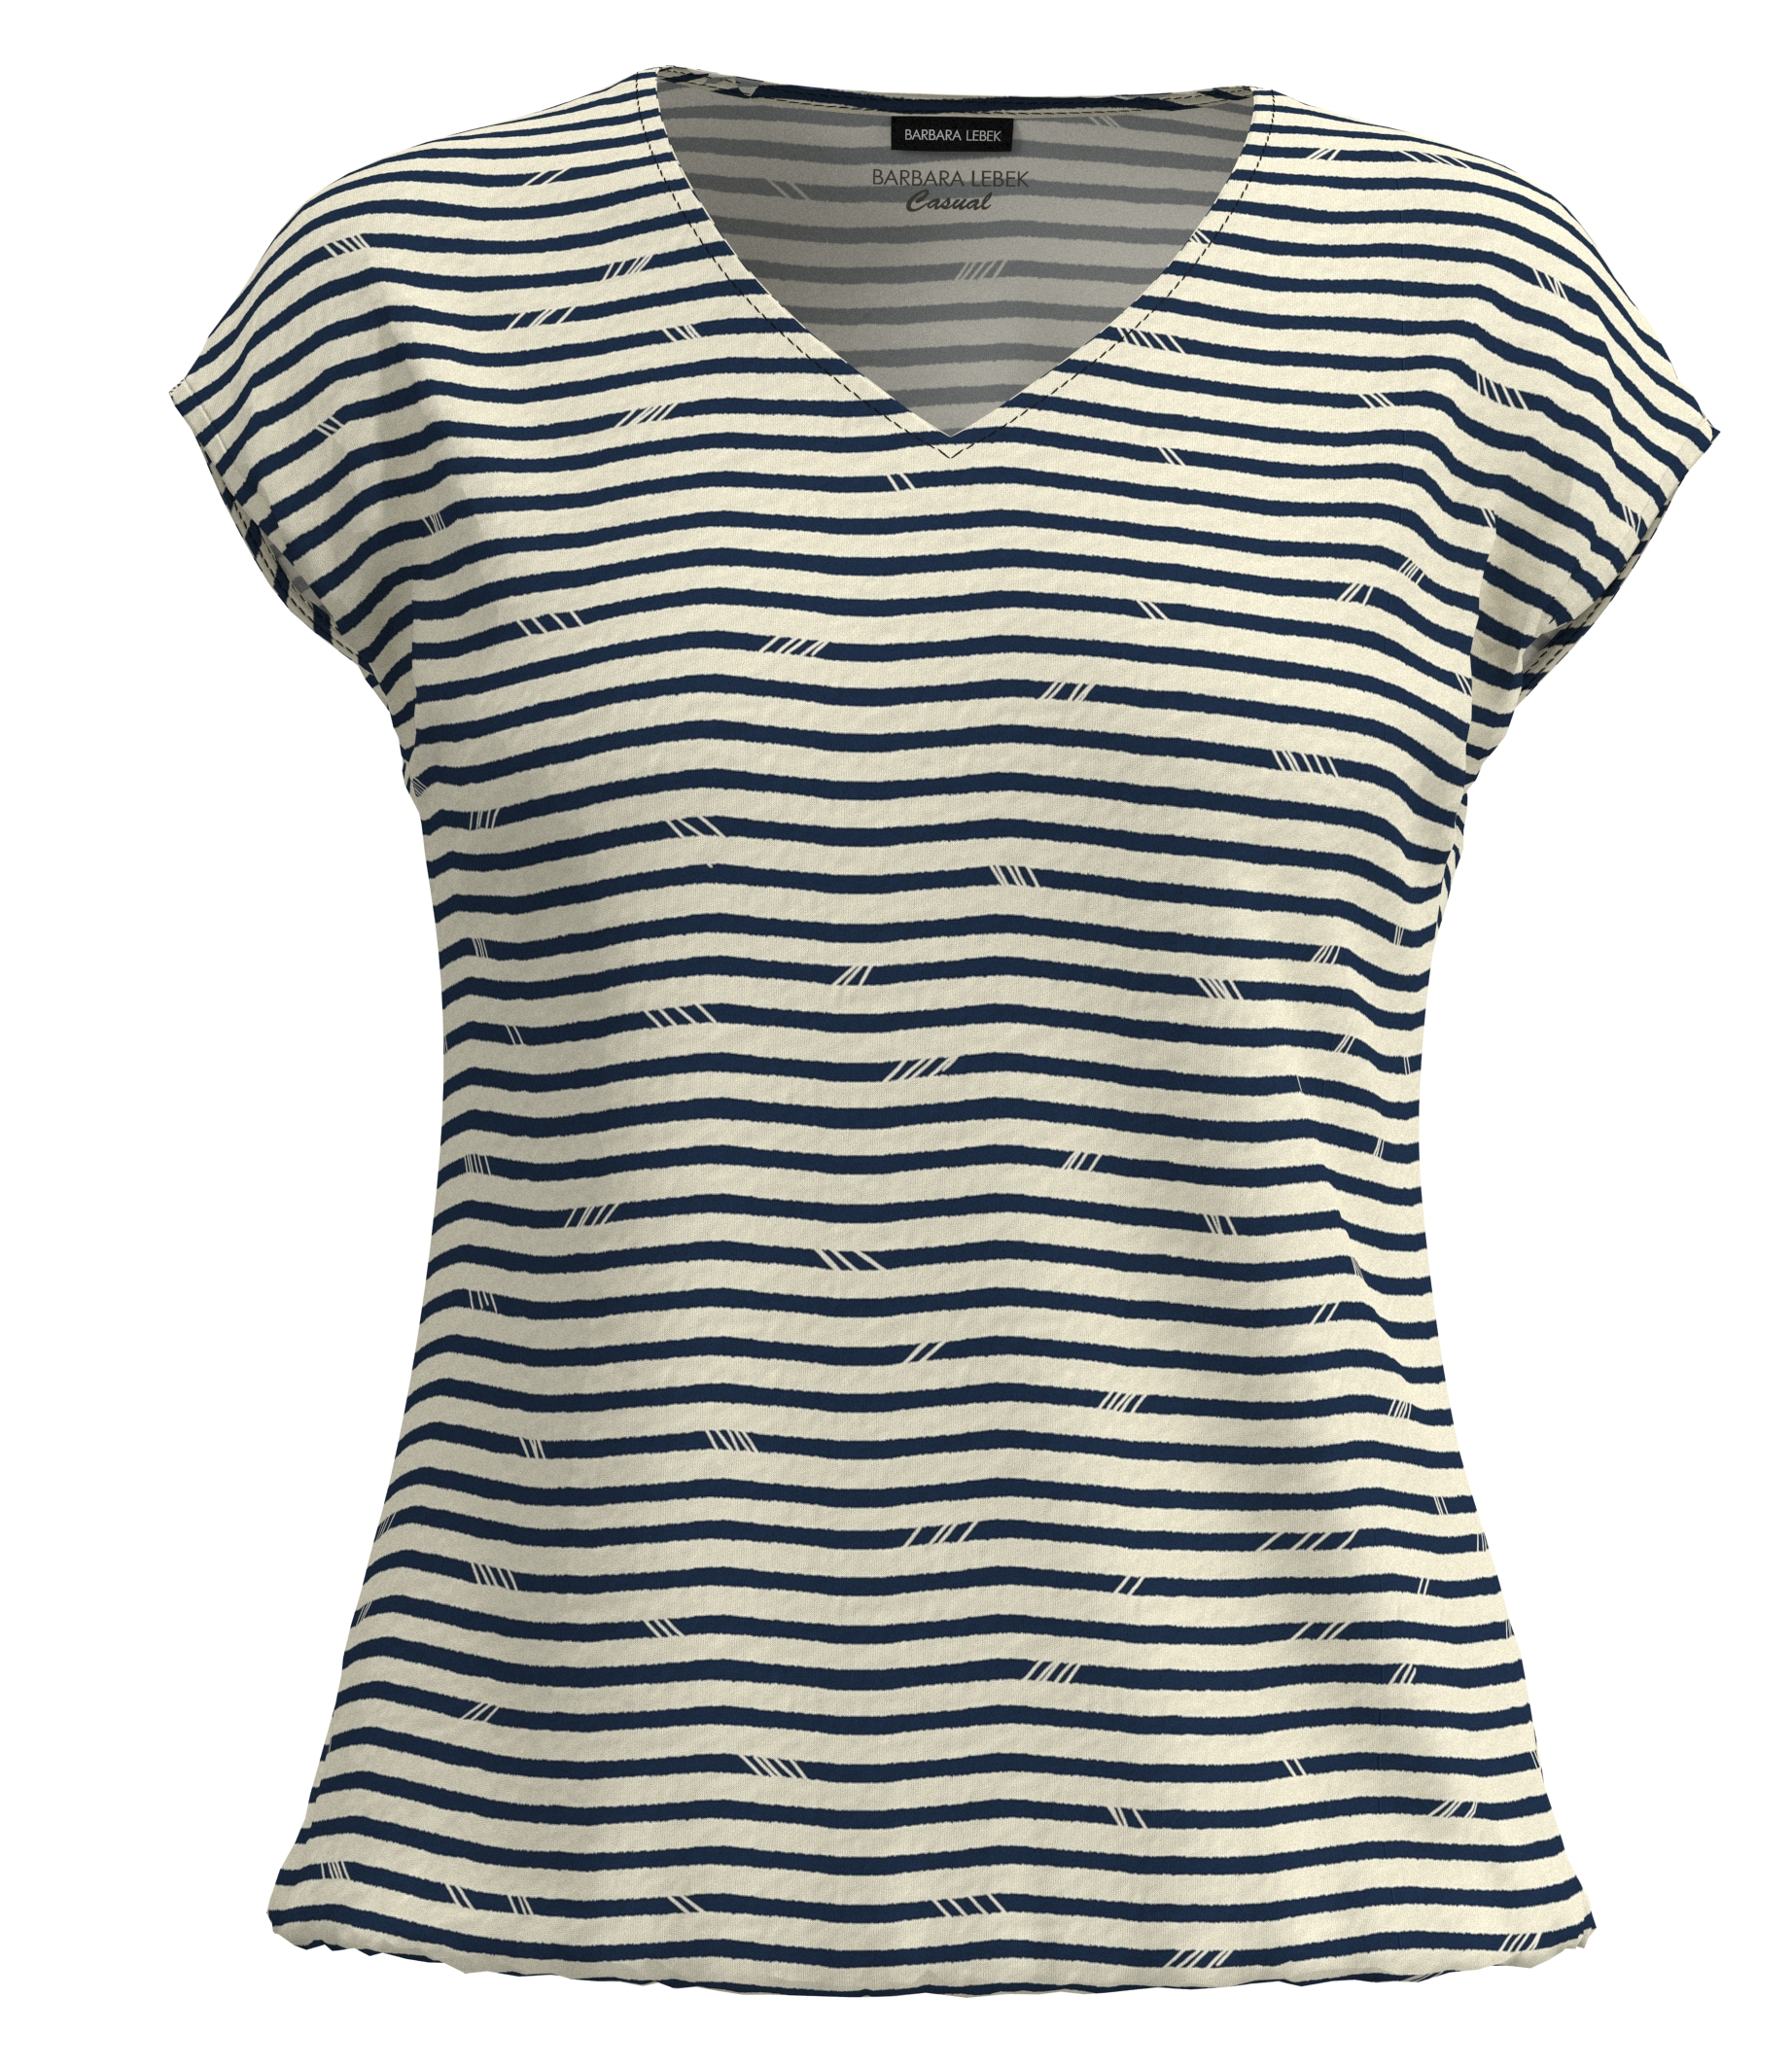 Barbara Lebek kurzarm Shirt blau gestreift